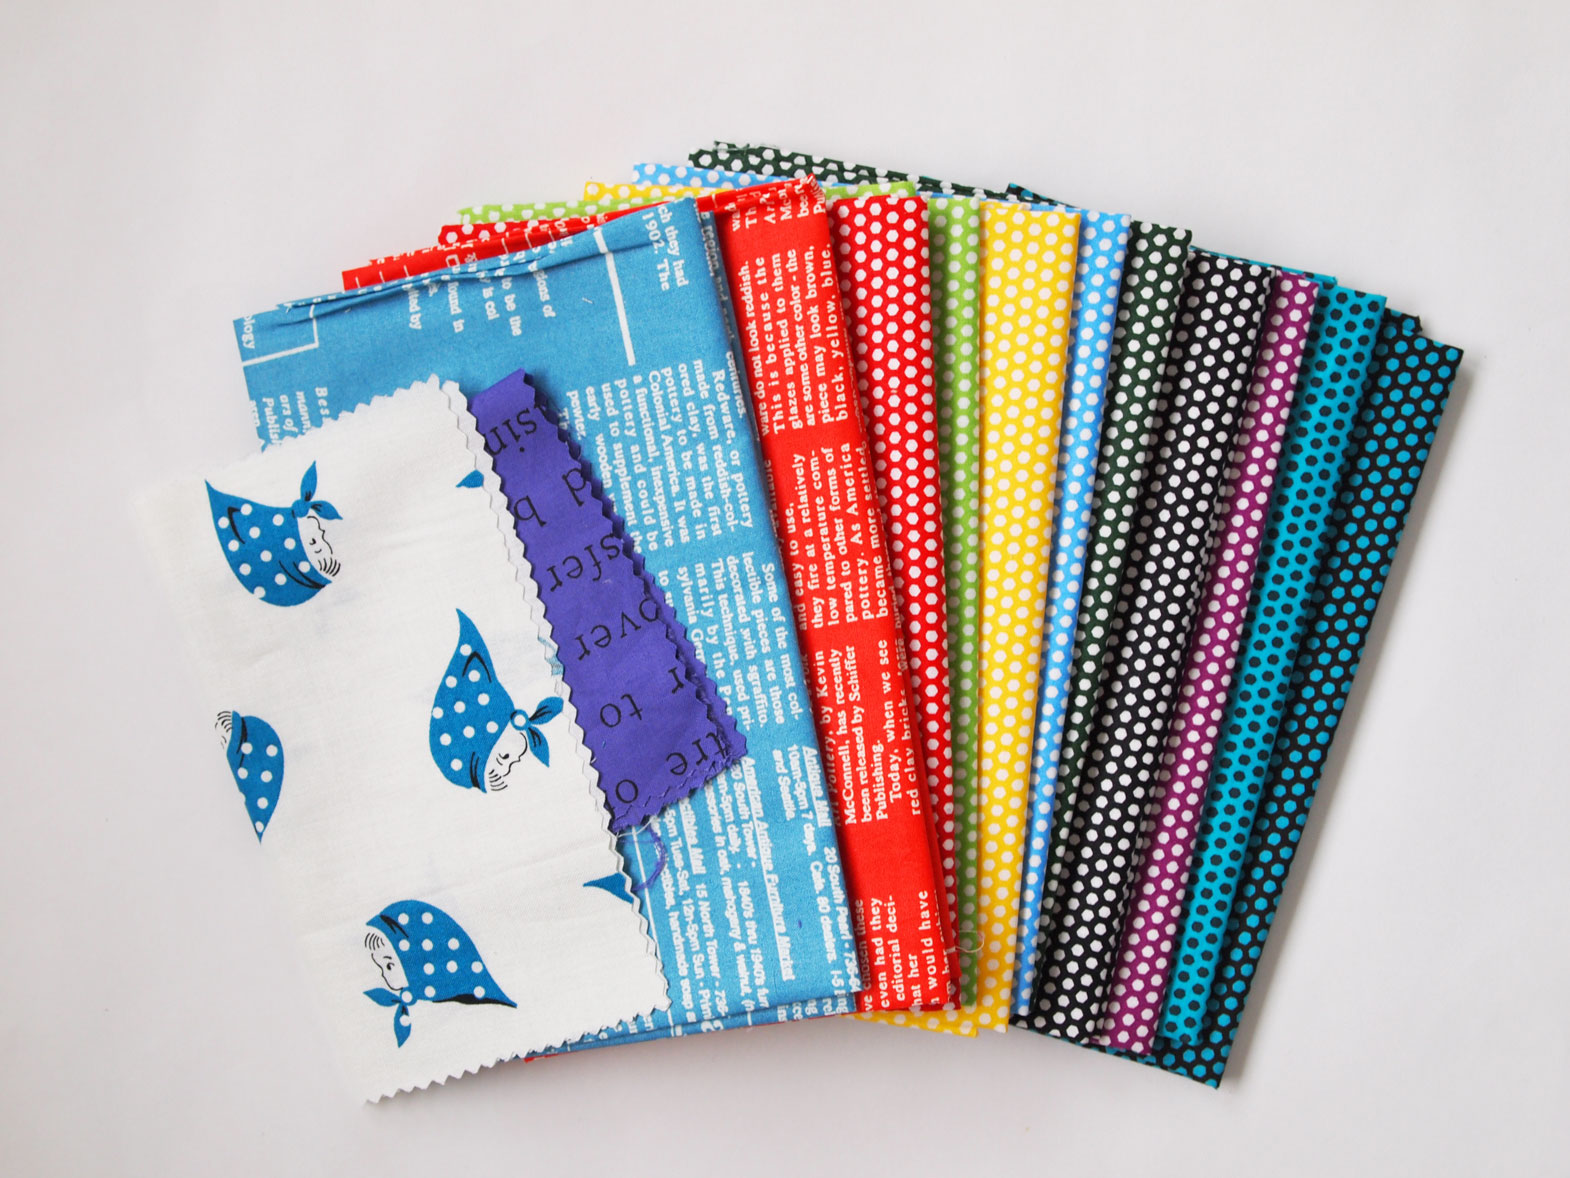 Koseki fabrics from BlijeOlifantje